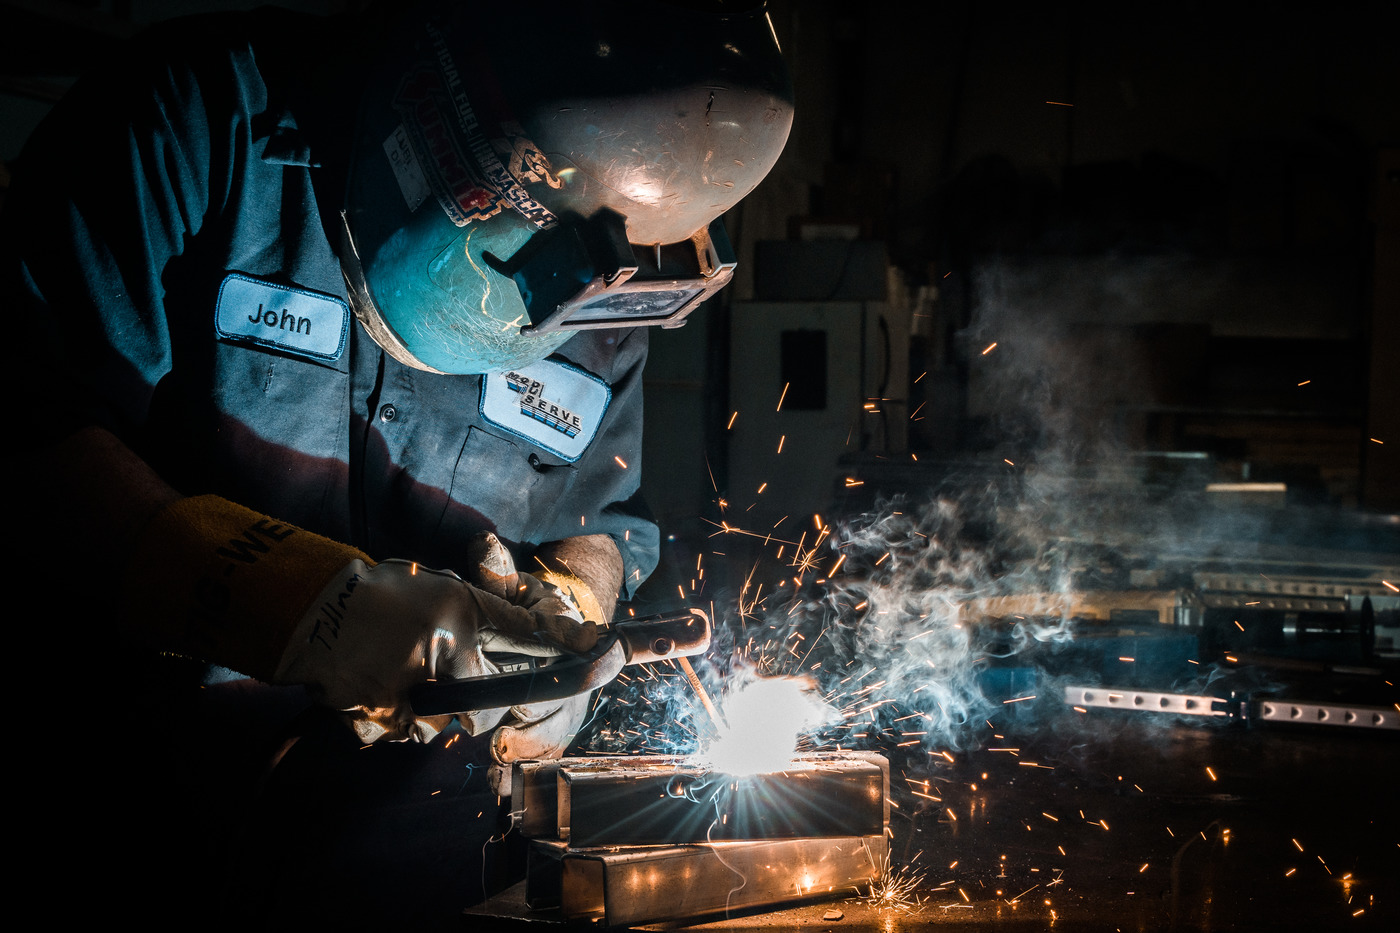 The Welding Image